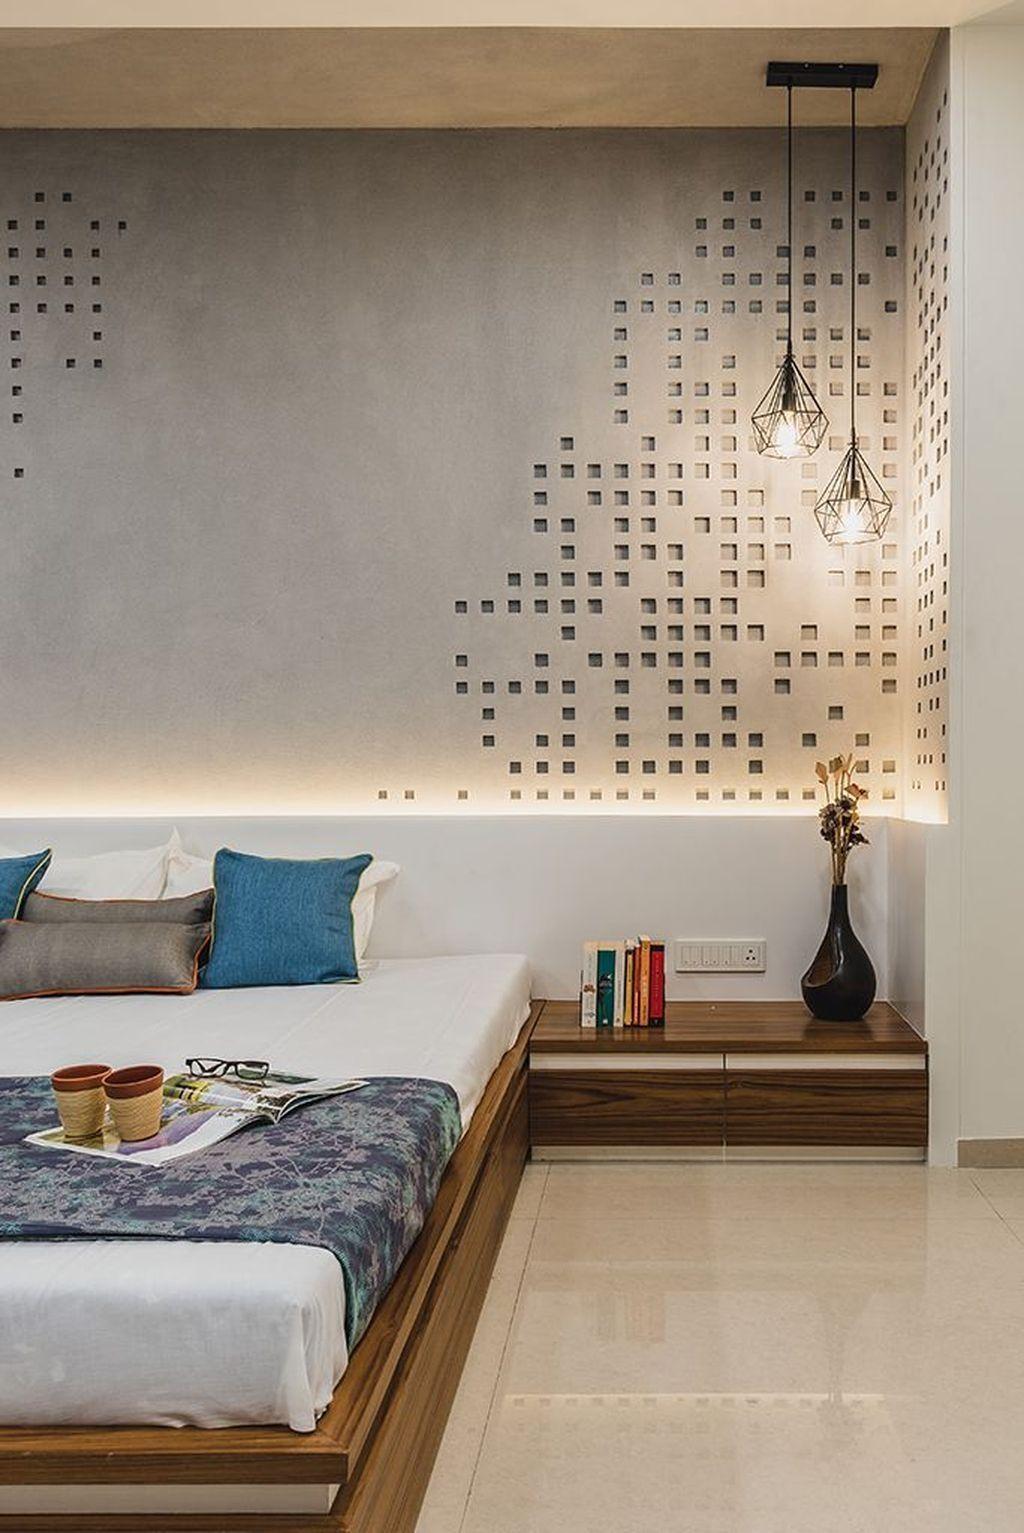 Pin By App Jani On Bed Idea Luxurious Bedrooms Minimalist